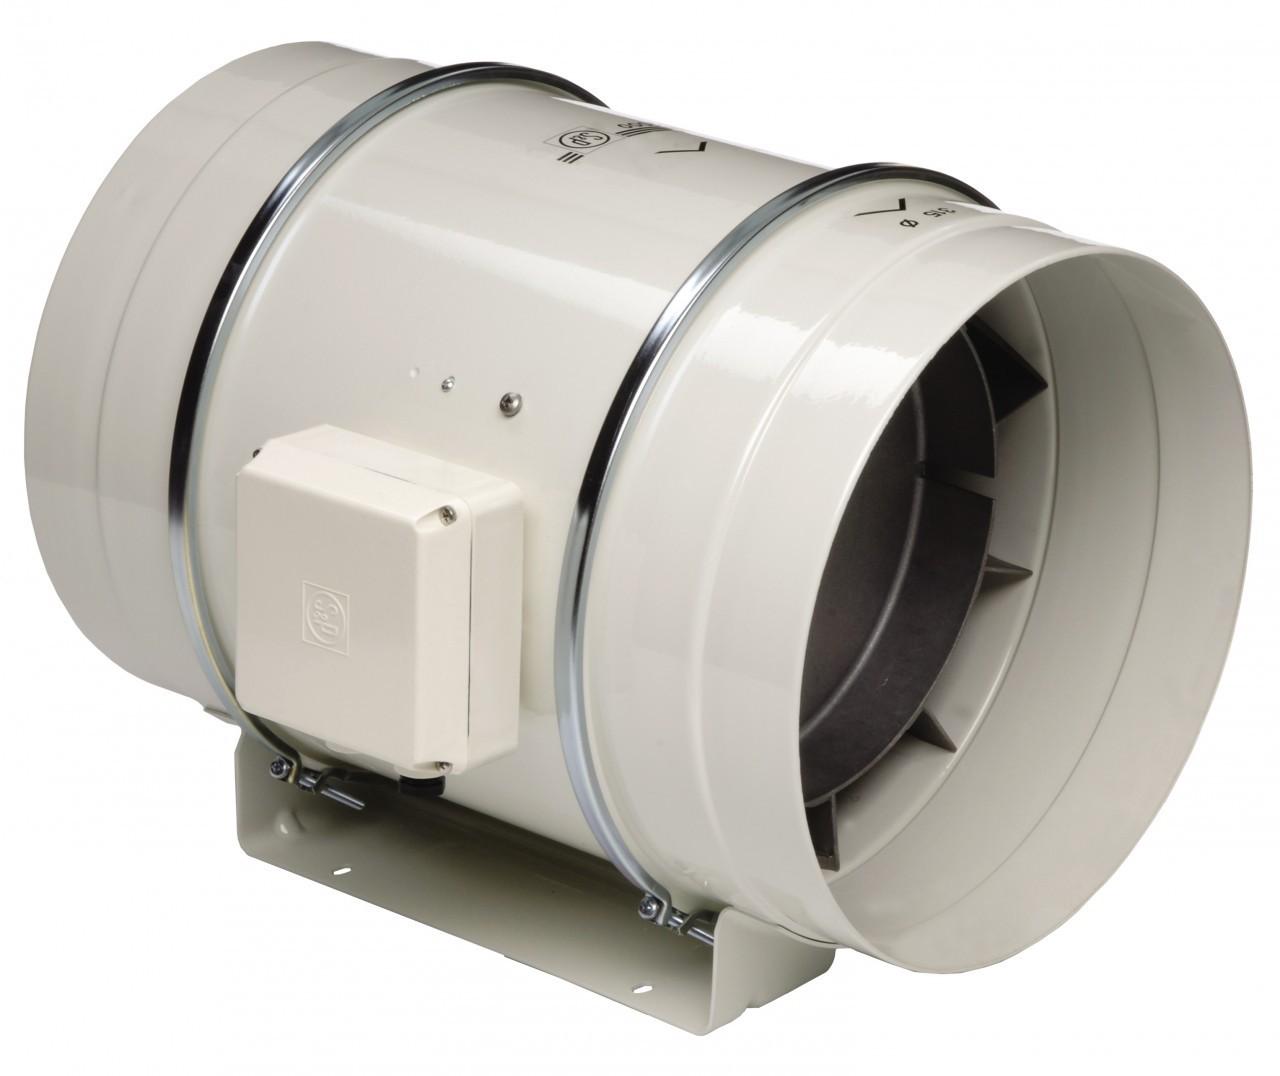 Exaustor syp td-1300/250